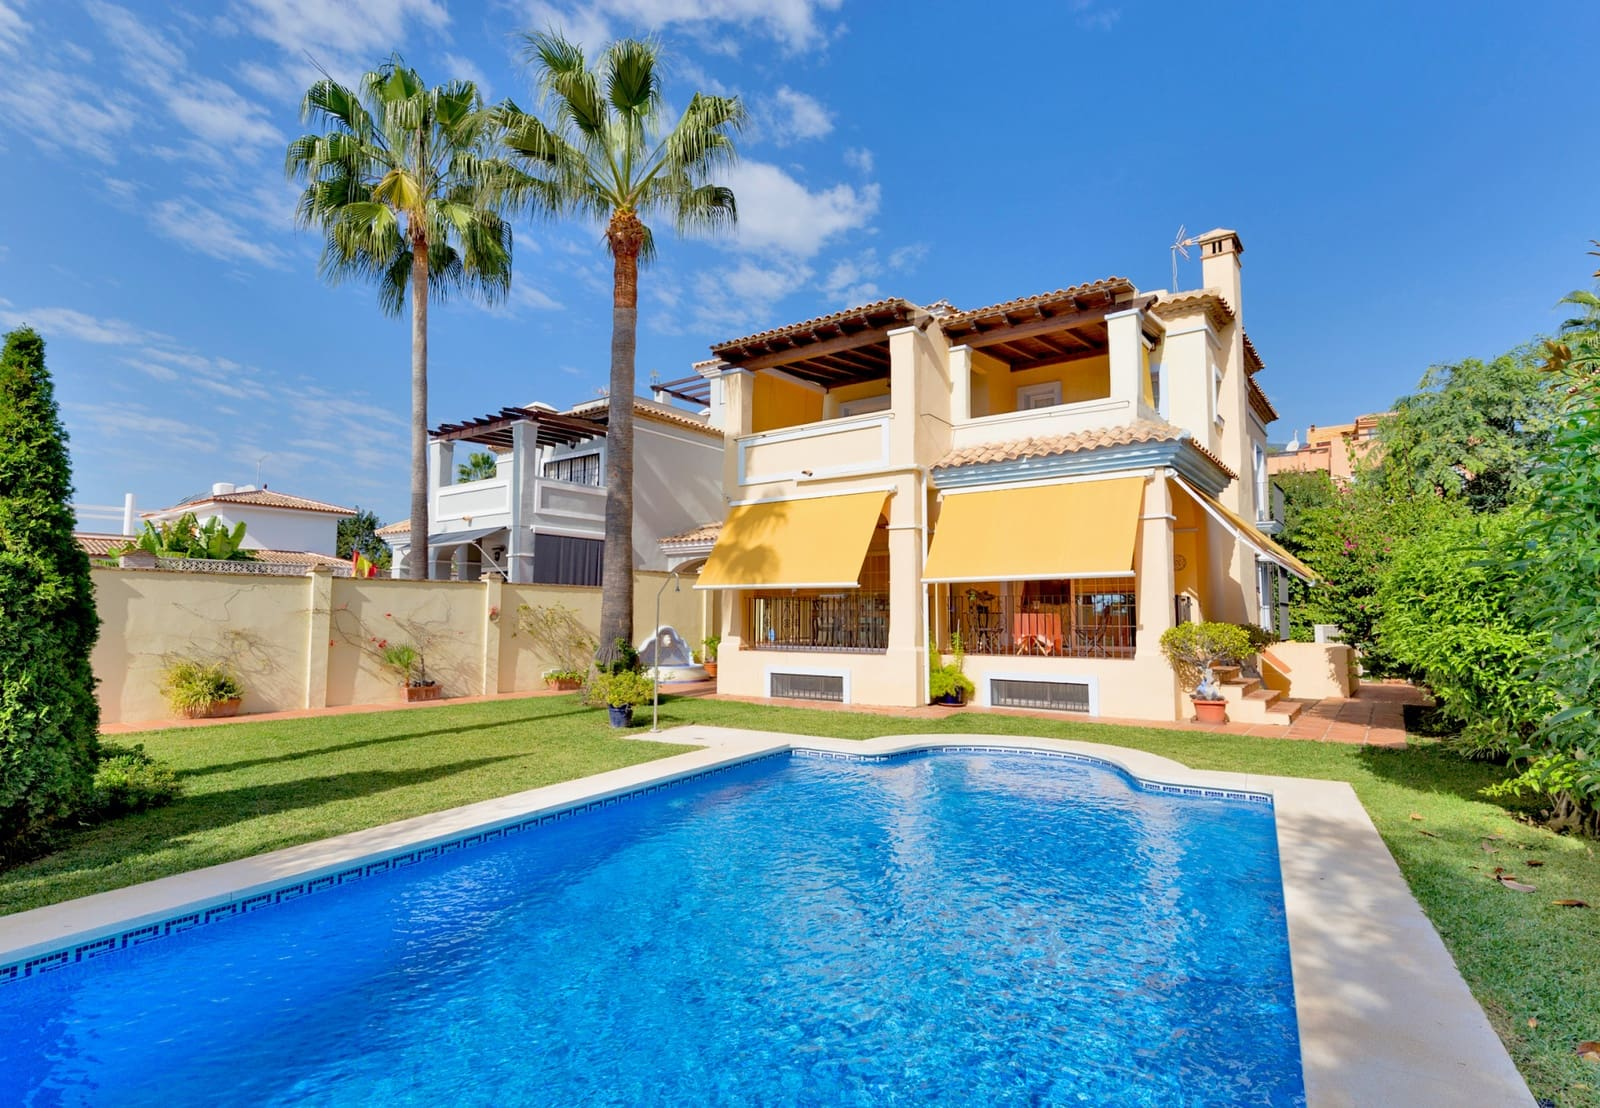 4 bedroom Villa for sale in Marbella with pool - € 749,000 (Ref: 5047591)